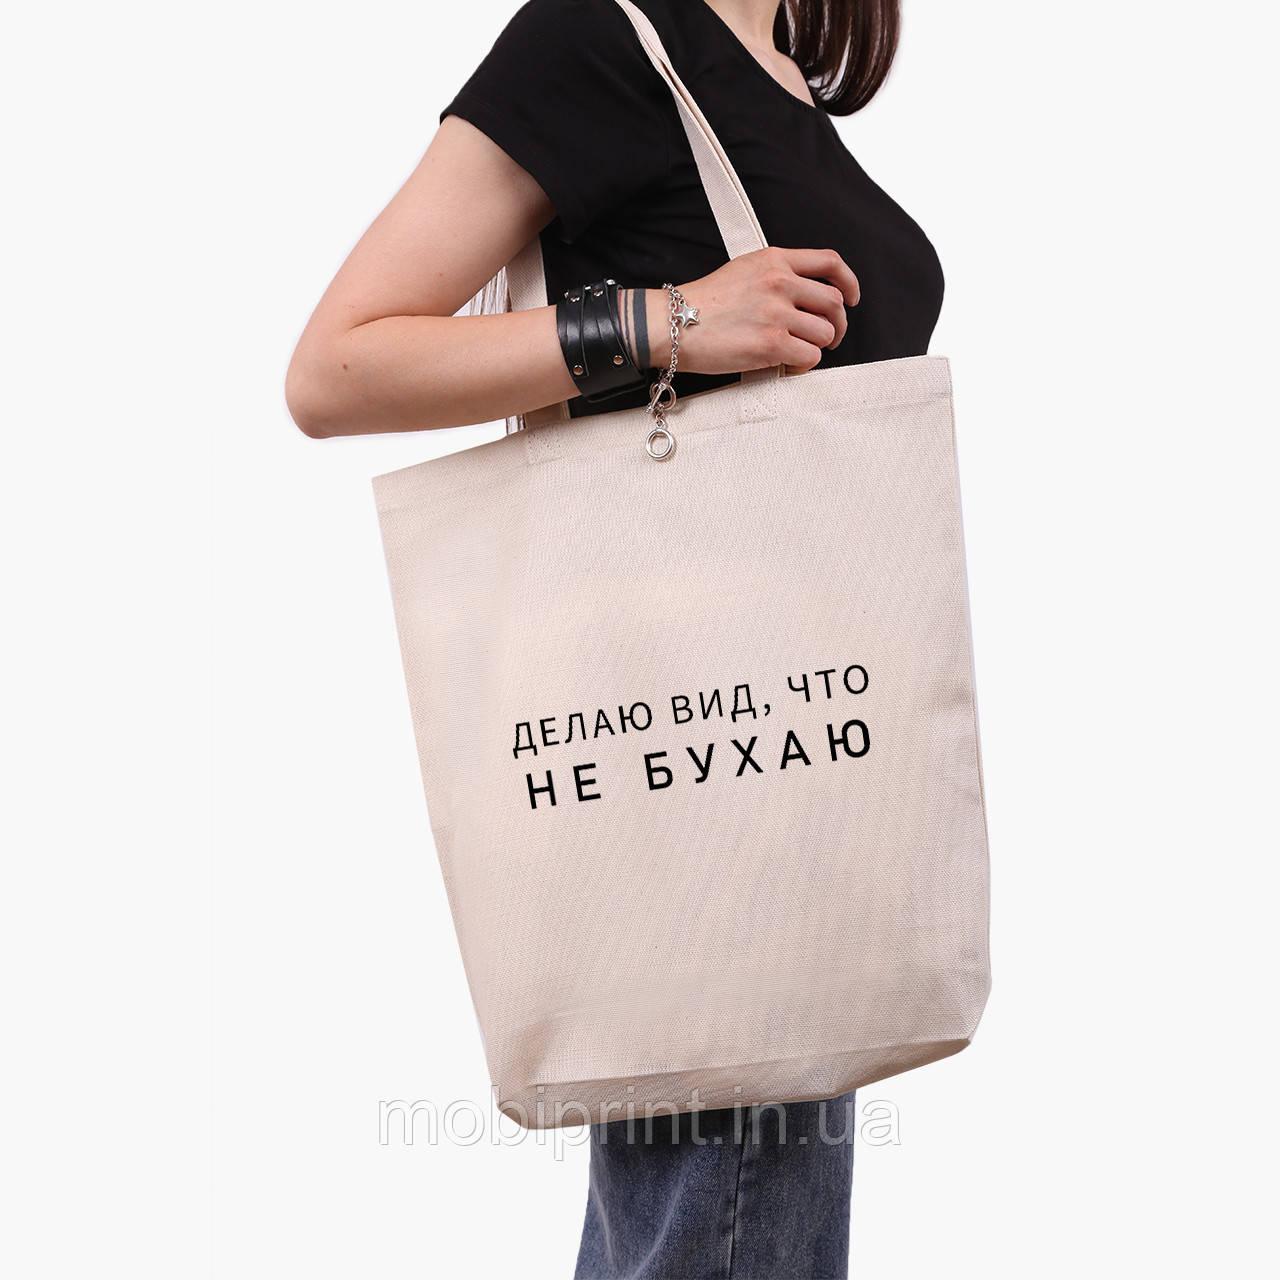 Эко сумка шоппер Не бухаю (I do not drink) (9227-1810) экосумка шопер 41*35 см